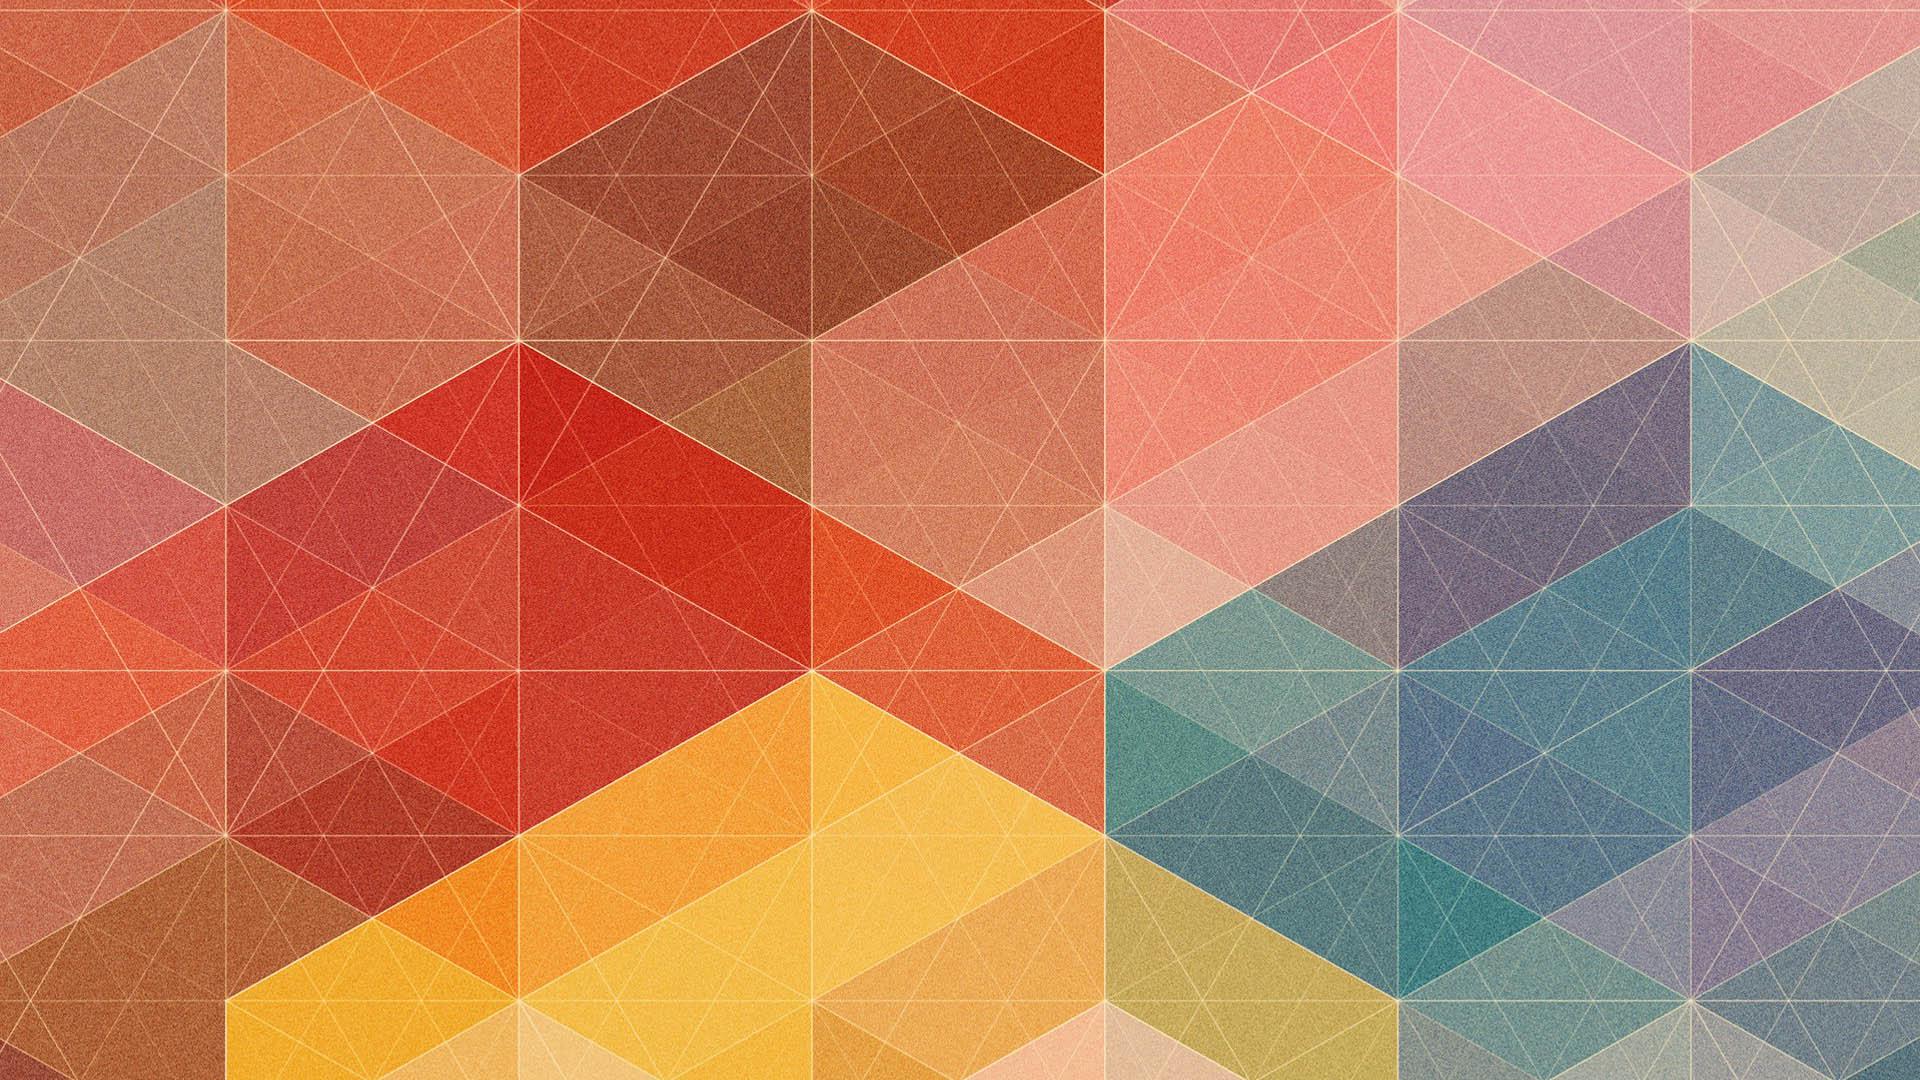 43 Geometric Abstract Wallpaper On Wallpapersafari